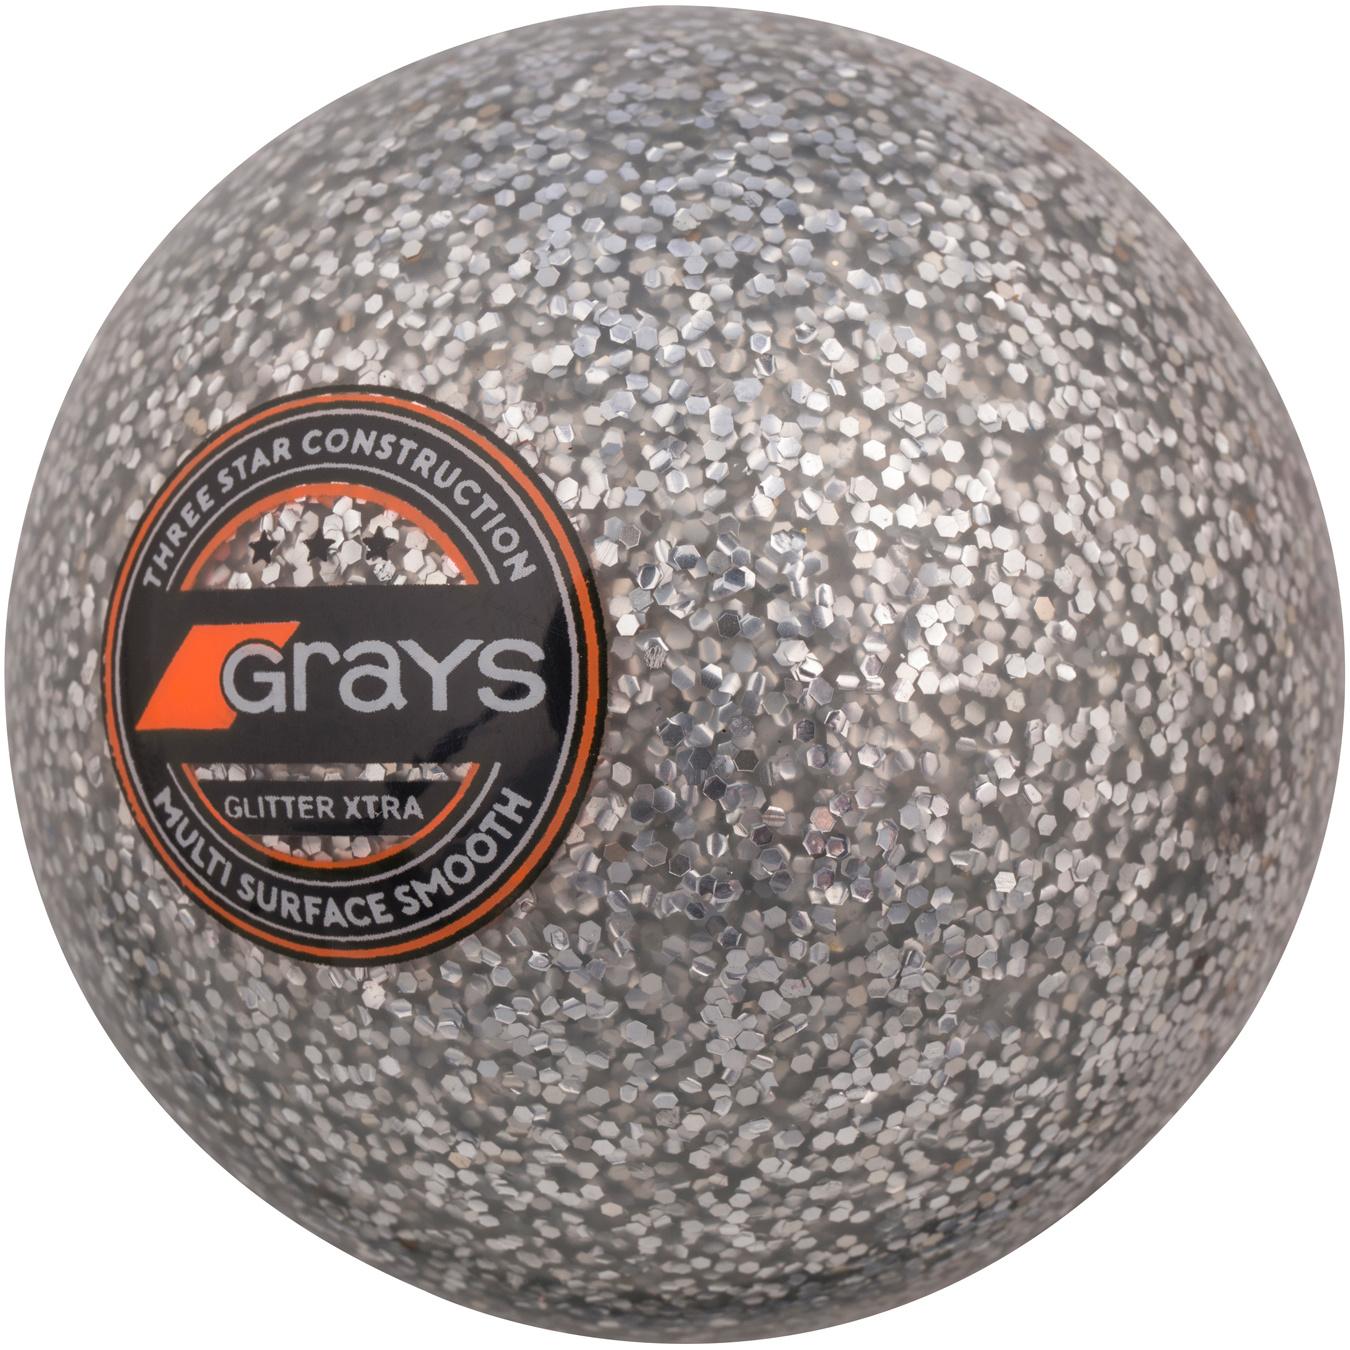 Grays Grays glitter bal zilver